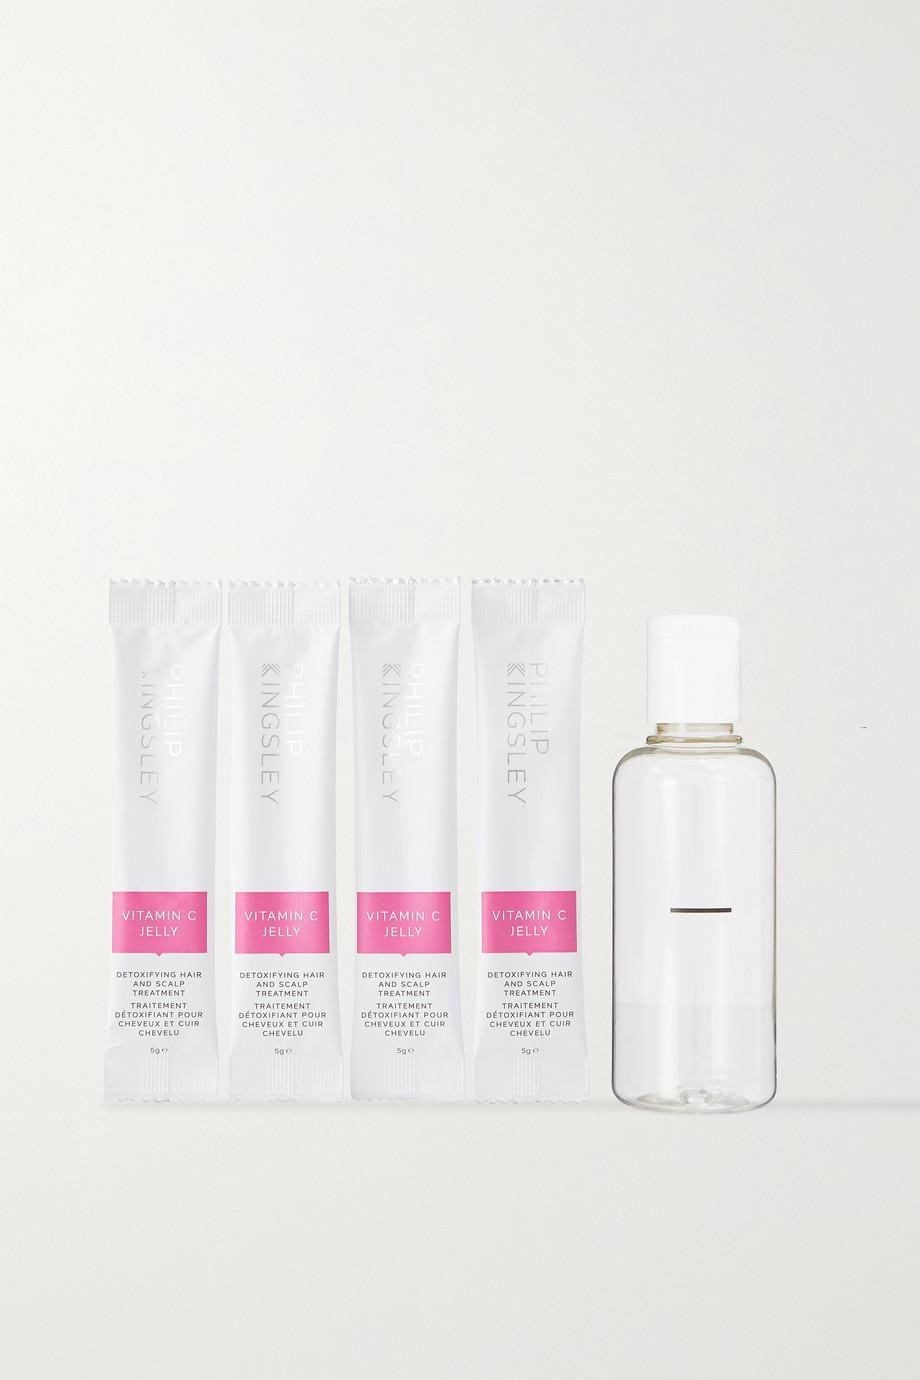 PHILIP KINGSLEY Vitamin C Jelly Detoxifying Hair and Scalp Treatment, 4 x 5g